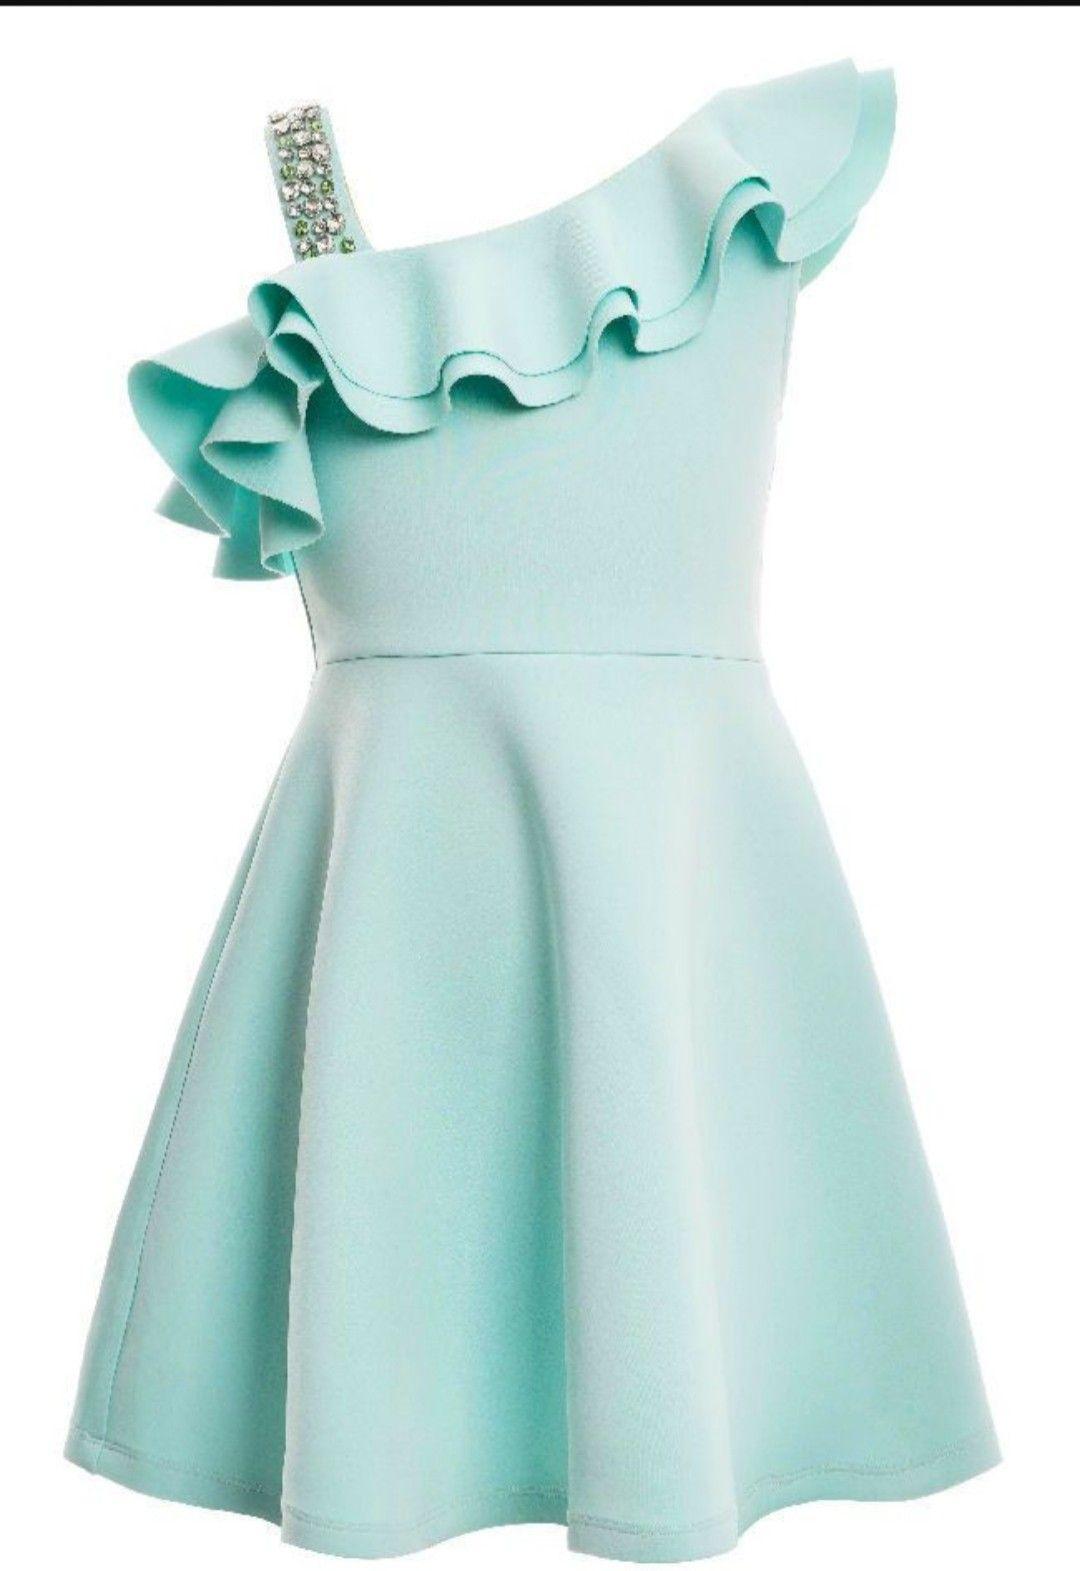 Me Encantaaaaaaaaaaa Girls Dresses Tween Girls Formal Dresses Teenage Girls Dresses [ 1571 x 1080 Pixel ]